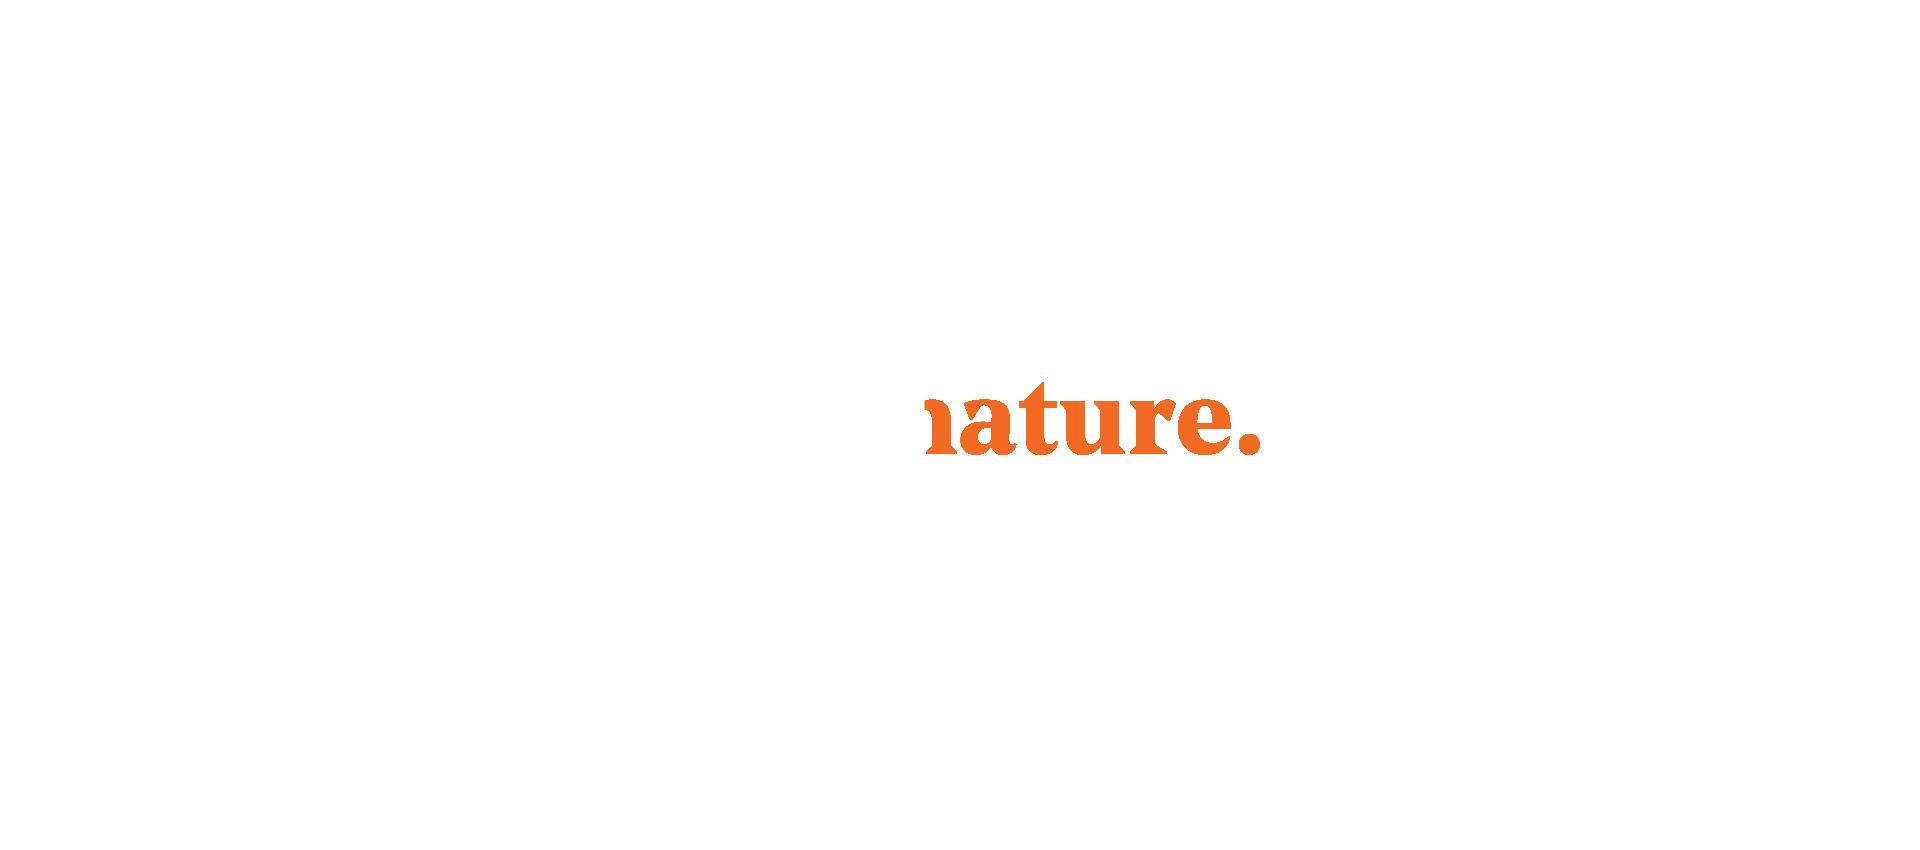 It's Humanature